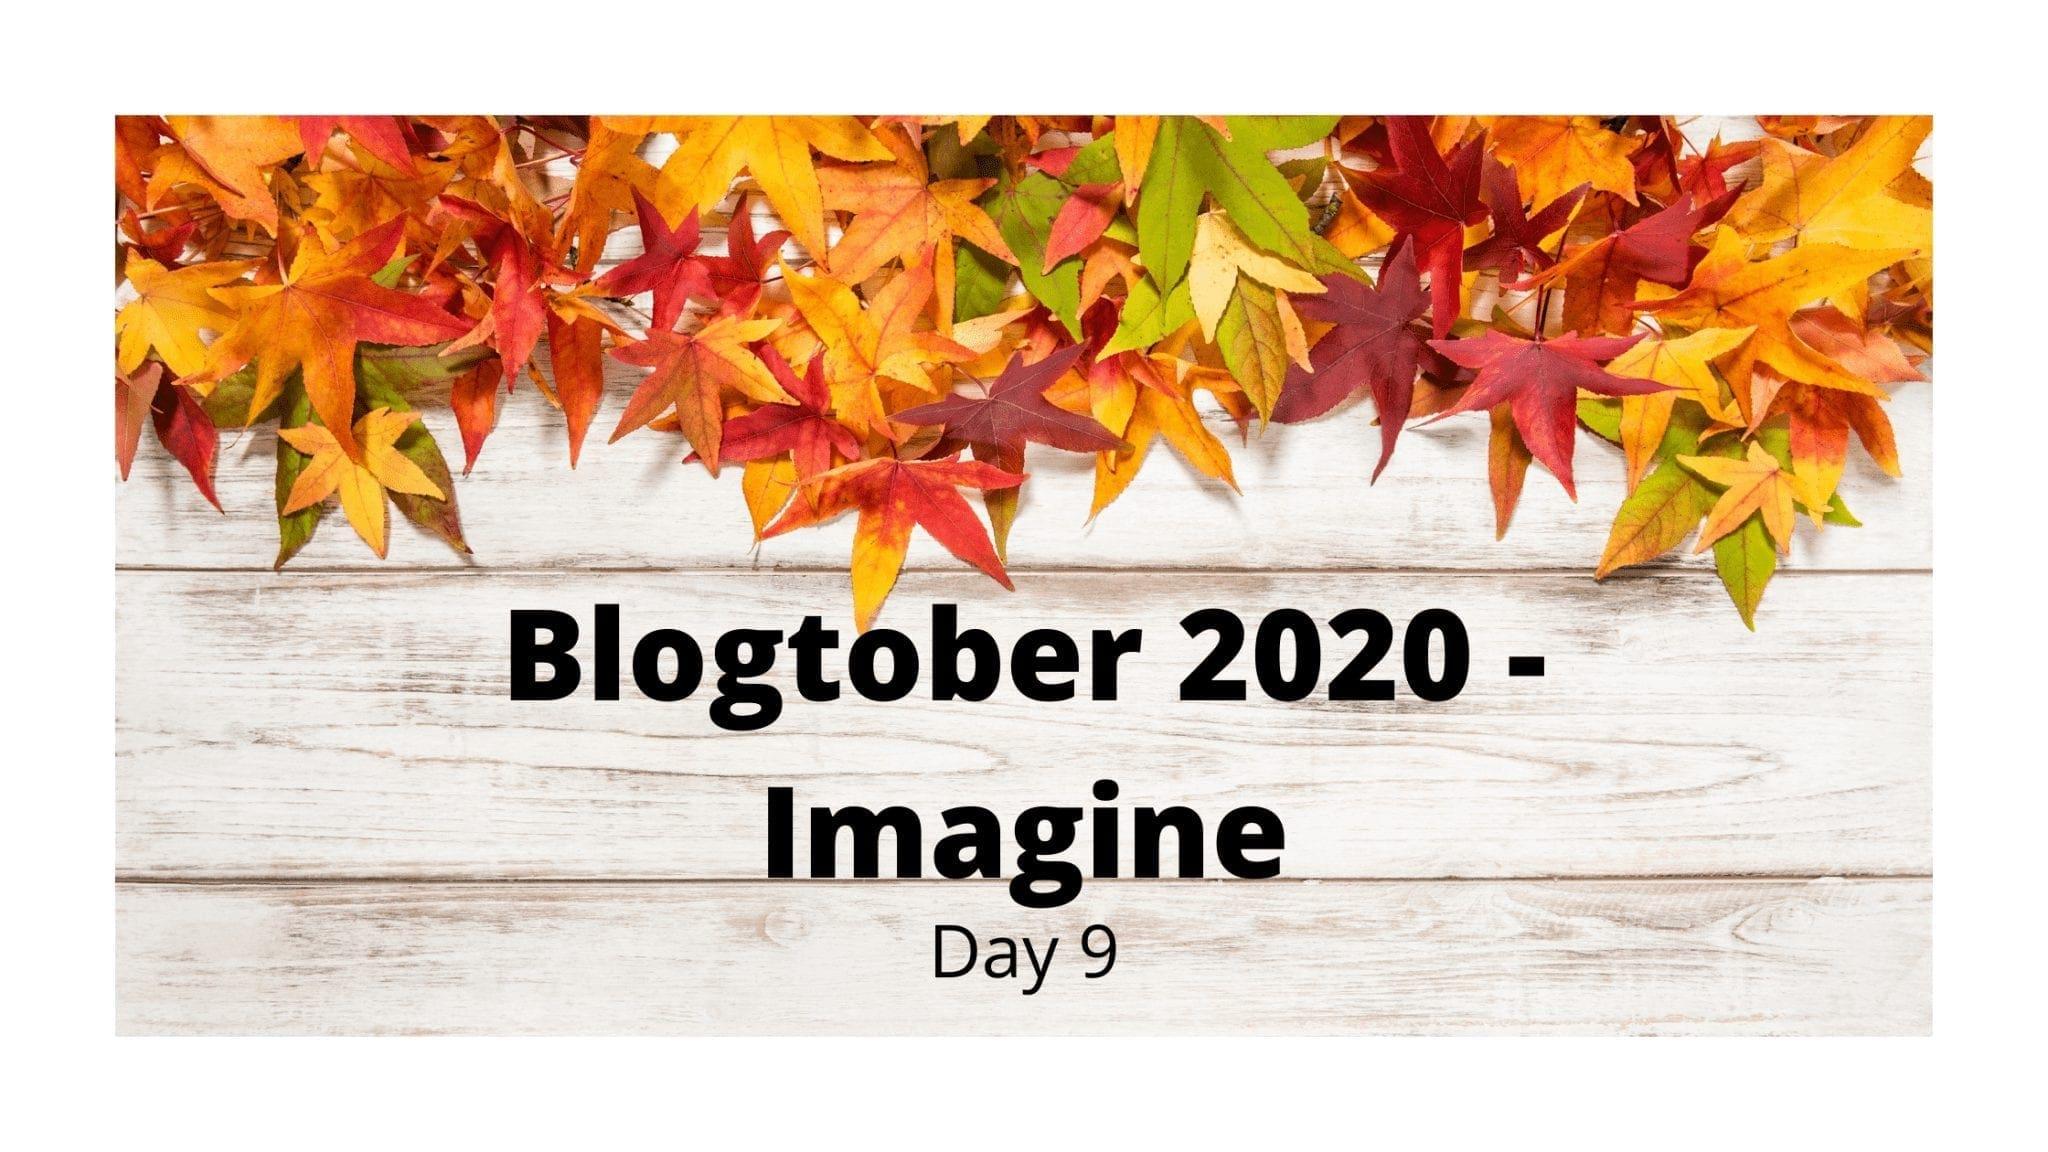 Blogtober 2020 - Imagine